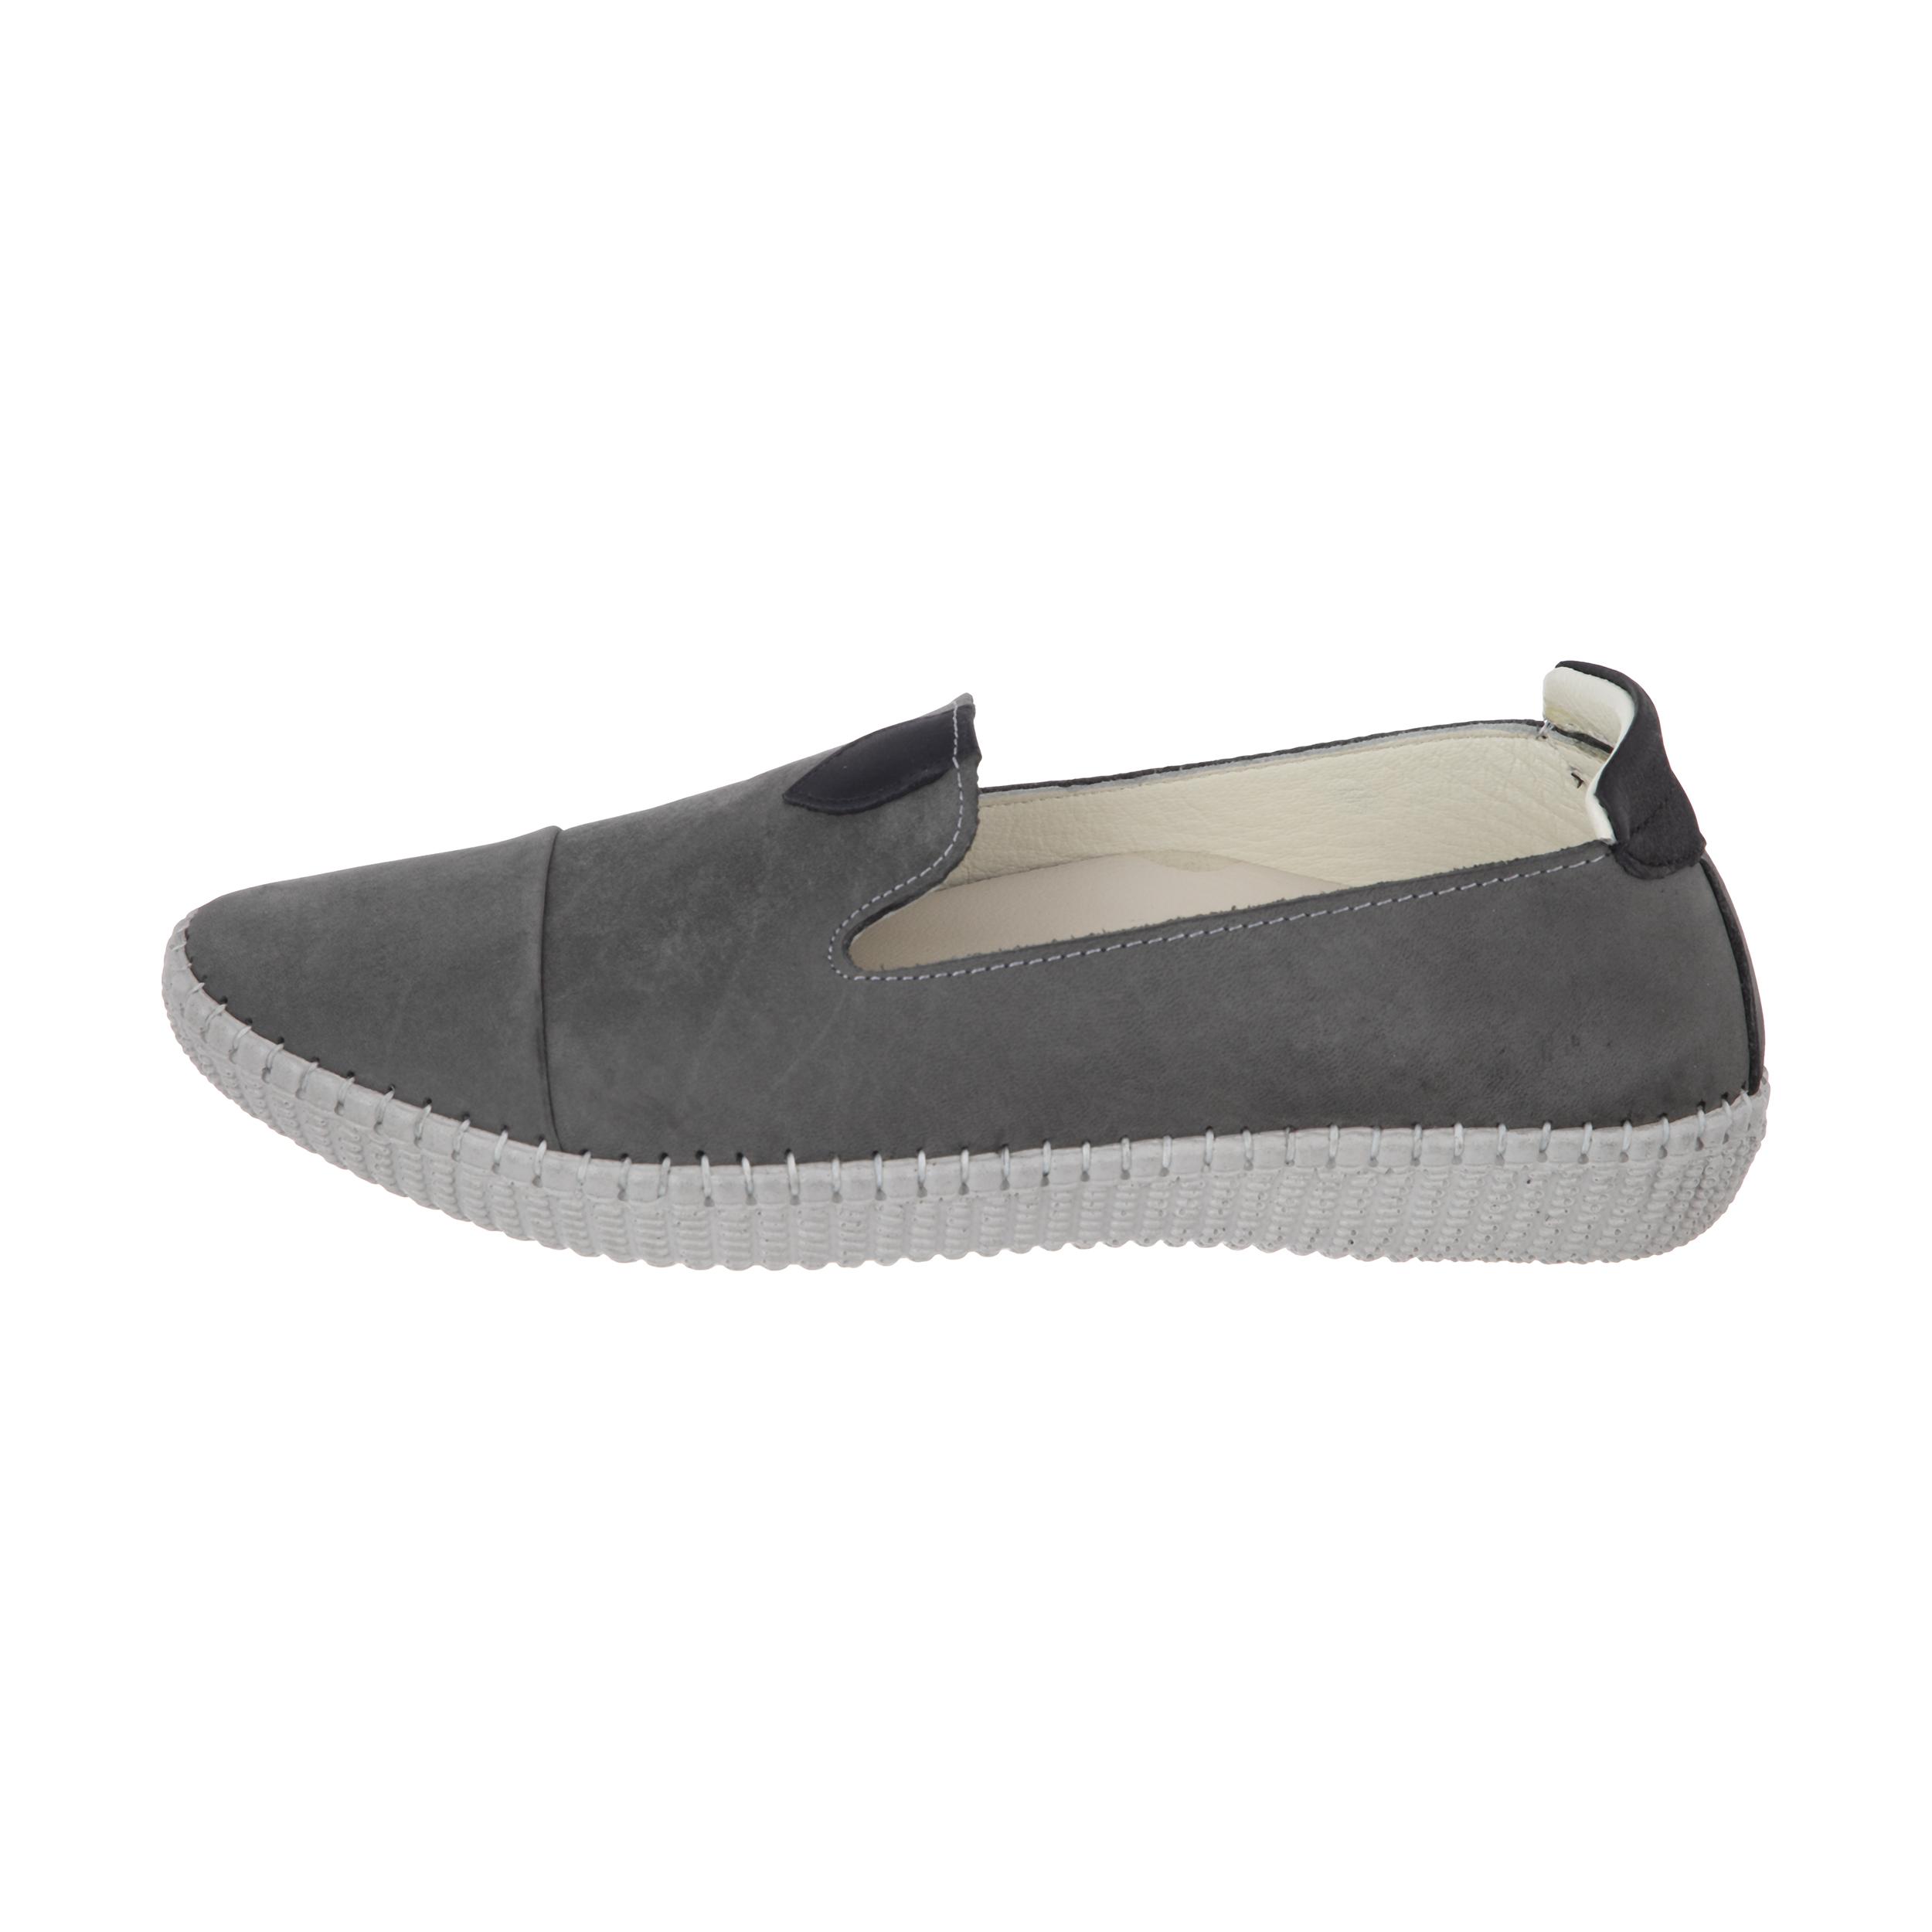 کفش روزمره زنانه گلسار مدل 5F03A500105